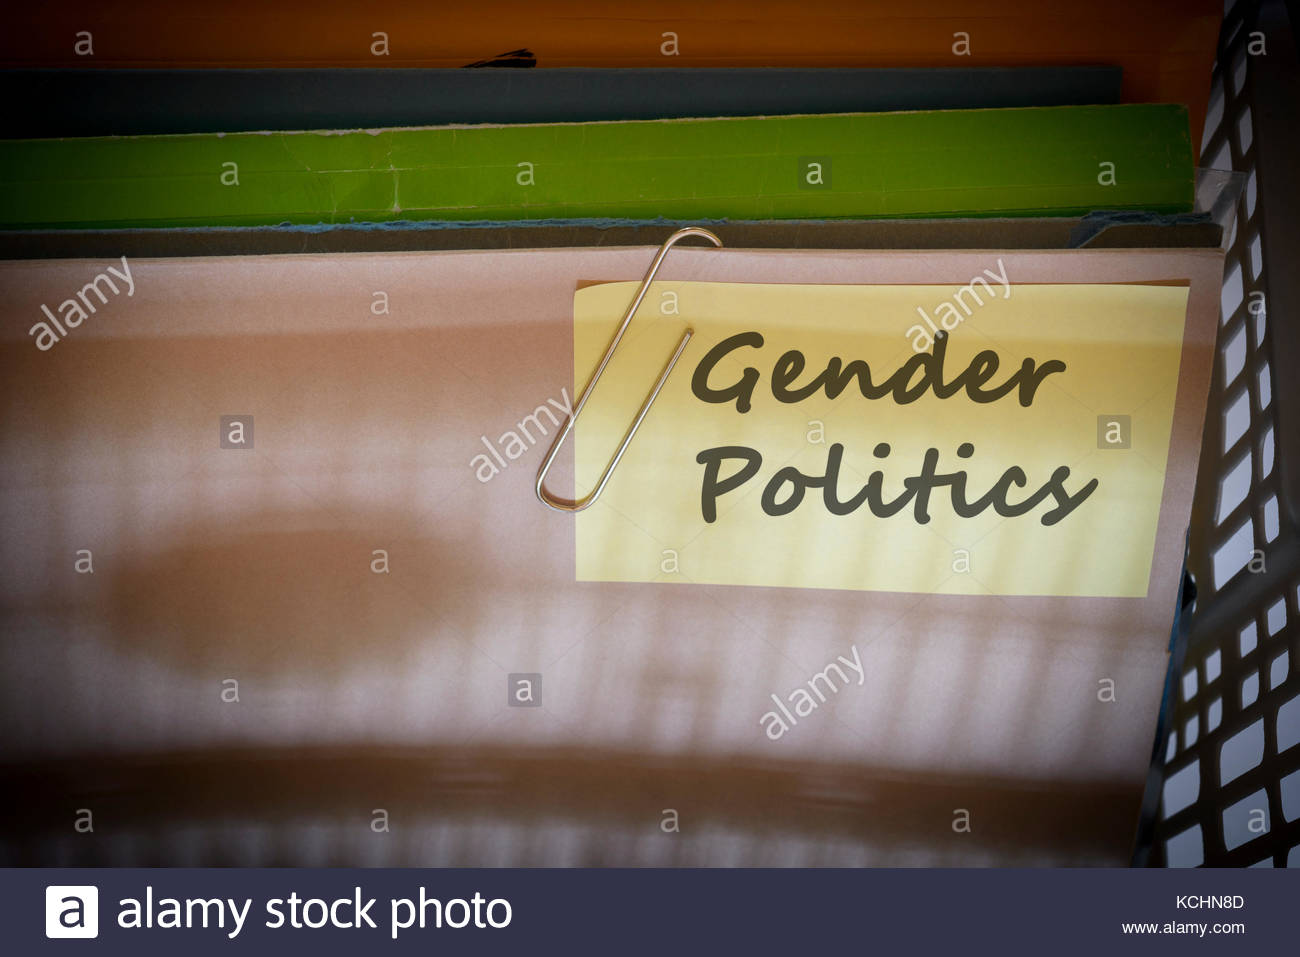 La política del género escrita en carpeta de documentos, Dorset, Inglaterra. Imagen De Stock